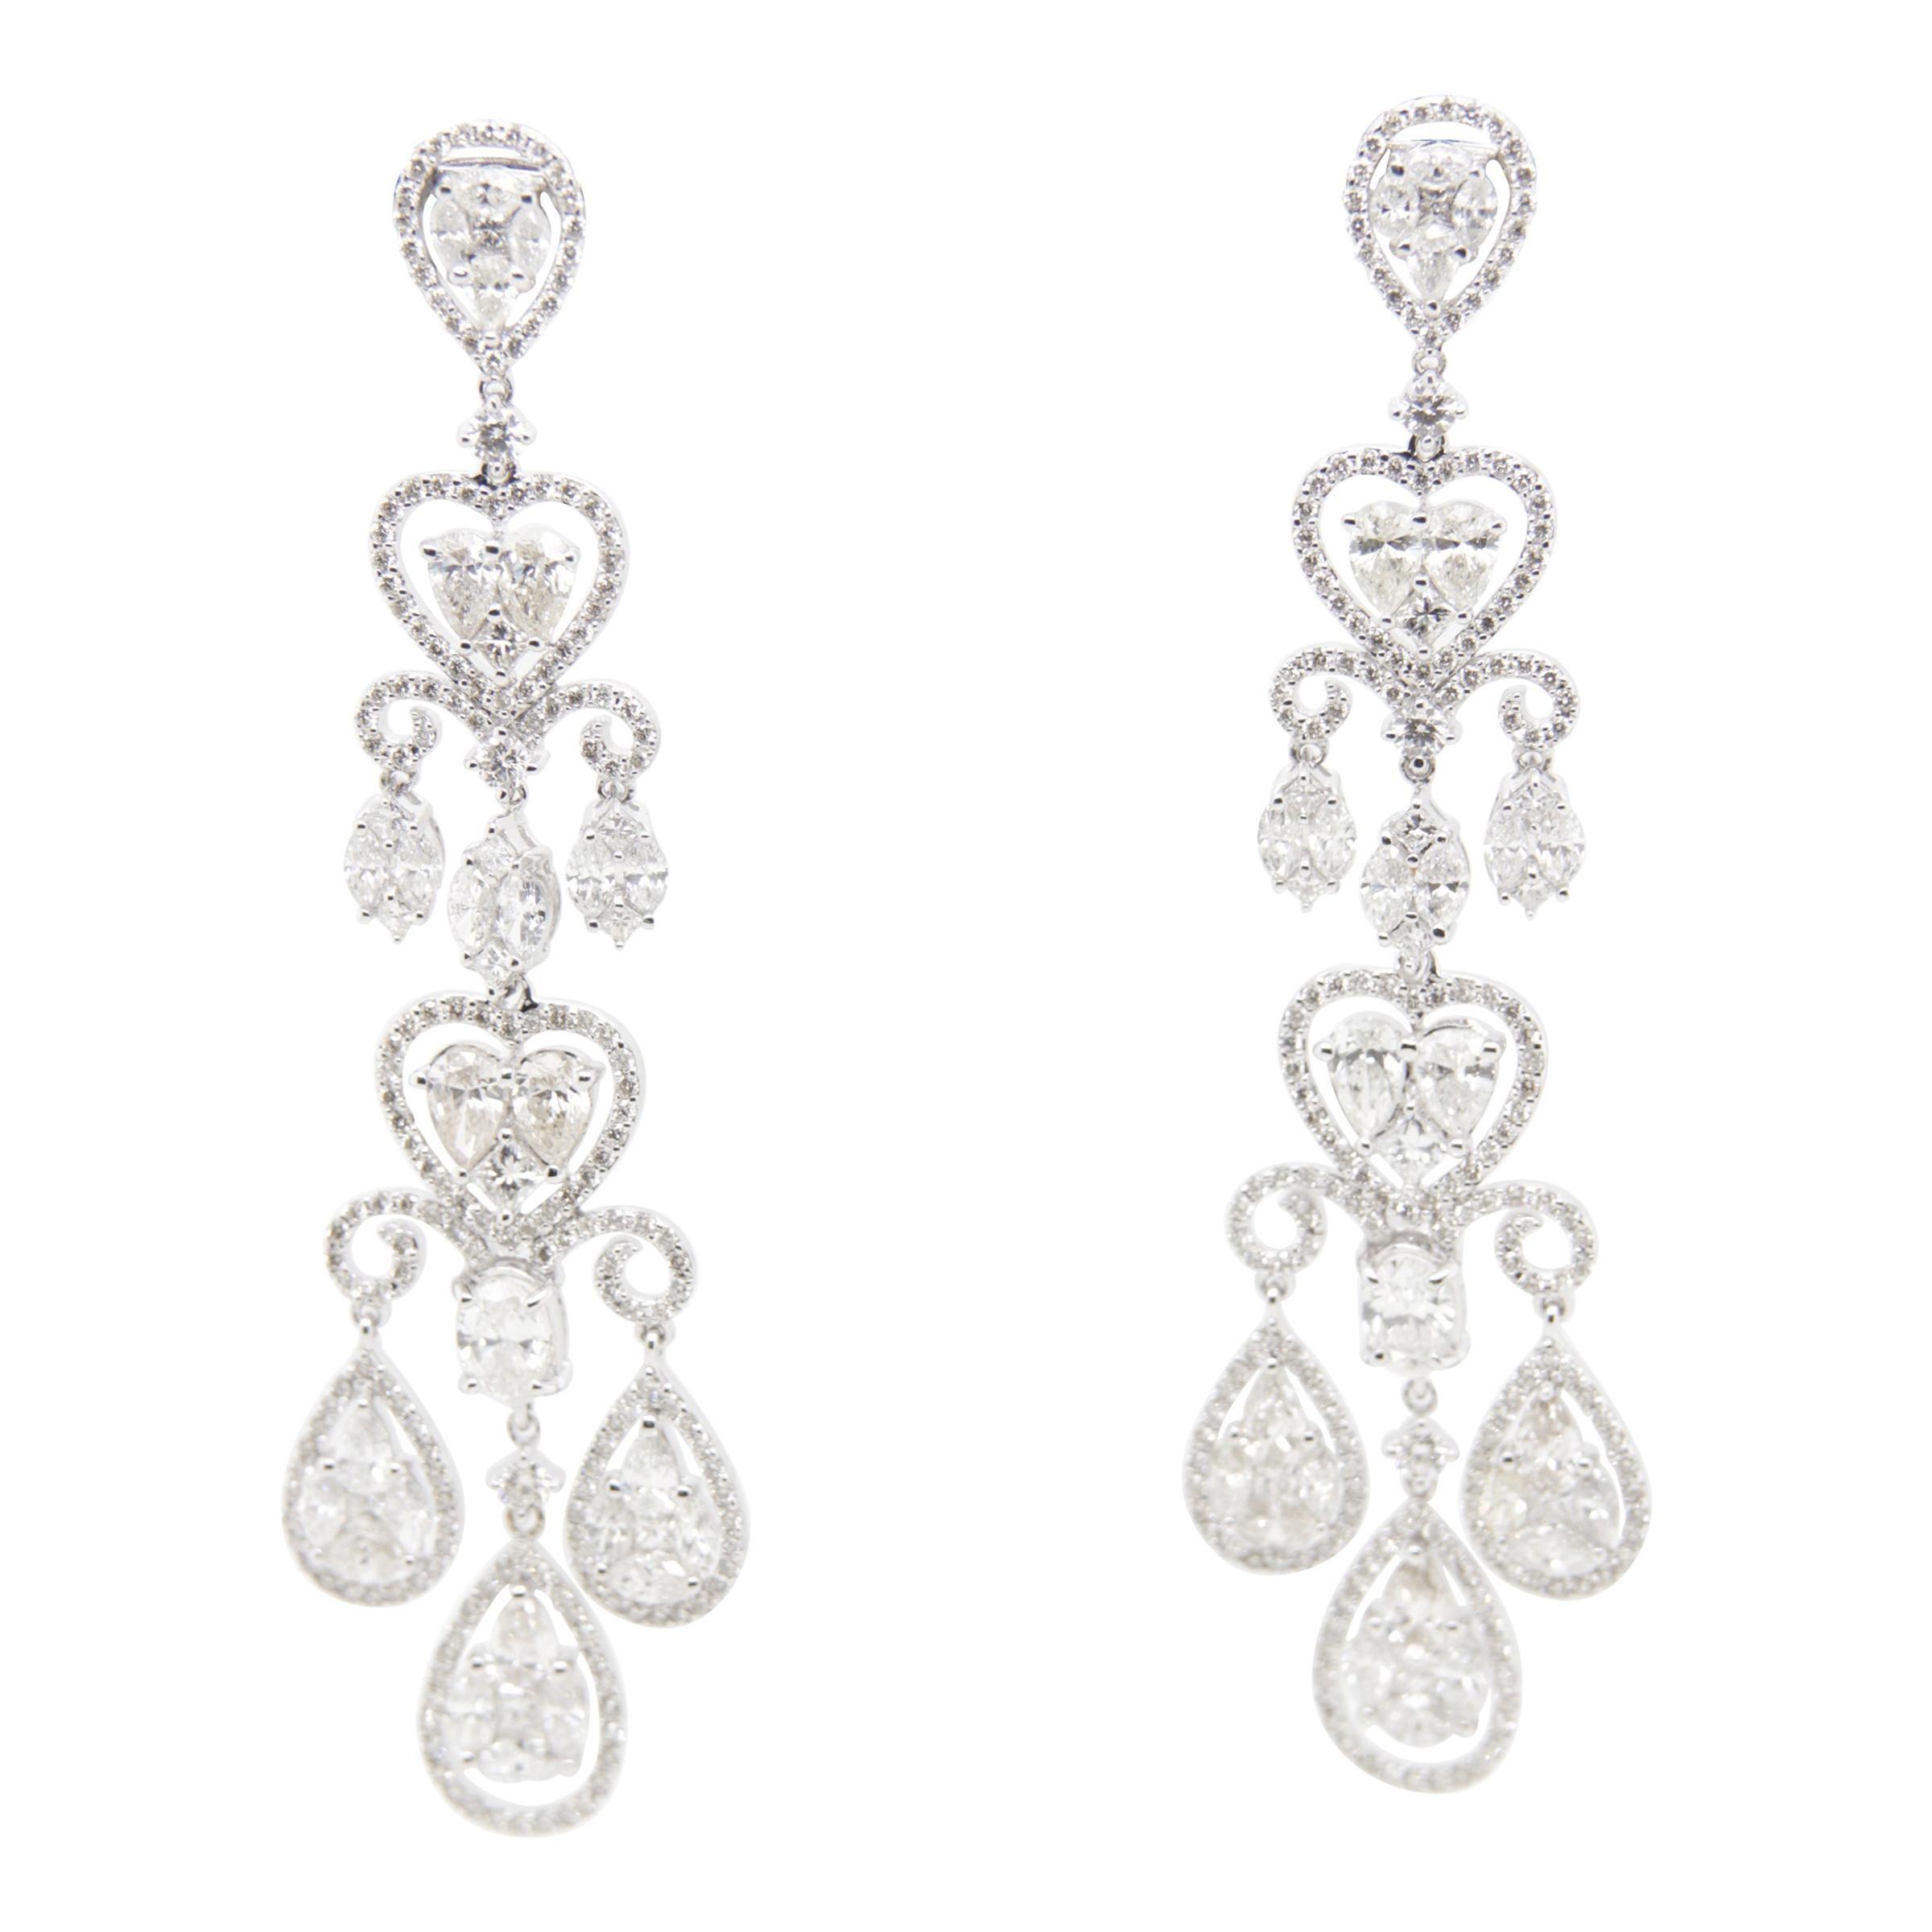 10 Carat Diamond Earring in 18 Karat Gold